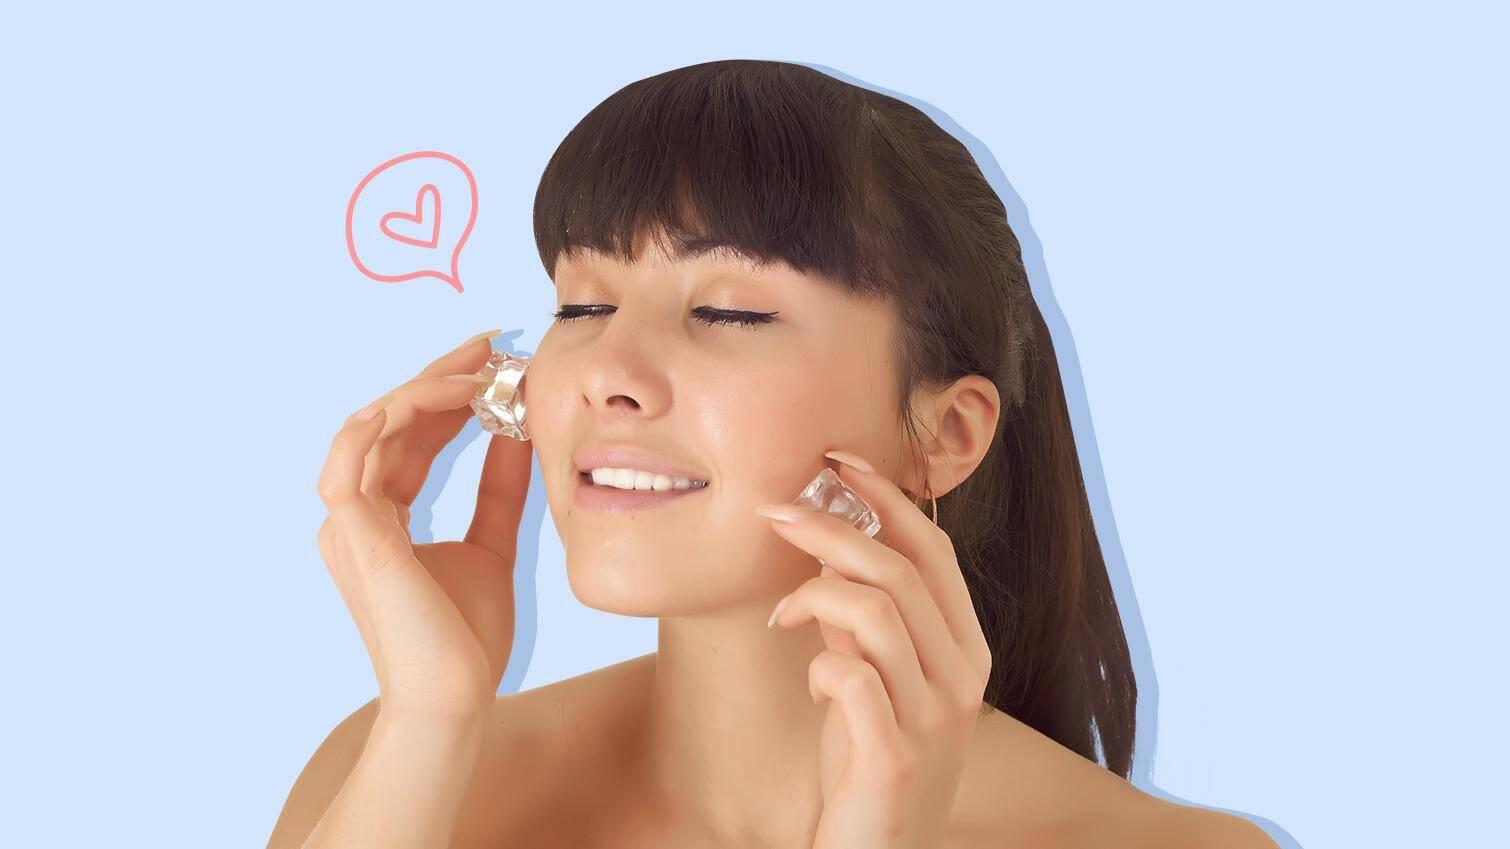 Manfaat Es Batu Untuk Kecantikan Wajah Yang Berjerawat Dan Berminyak